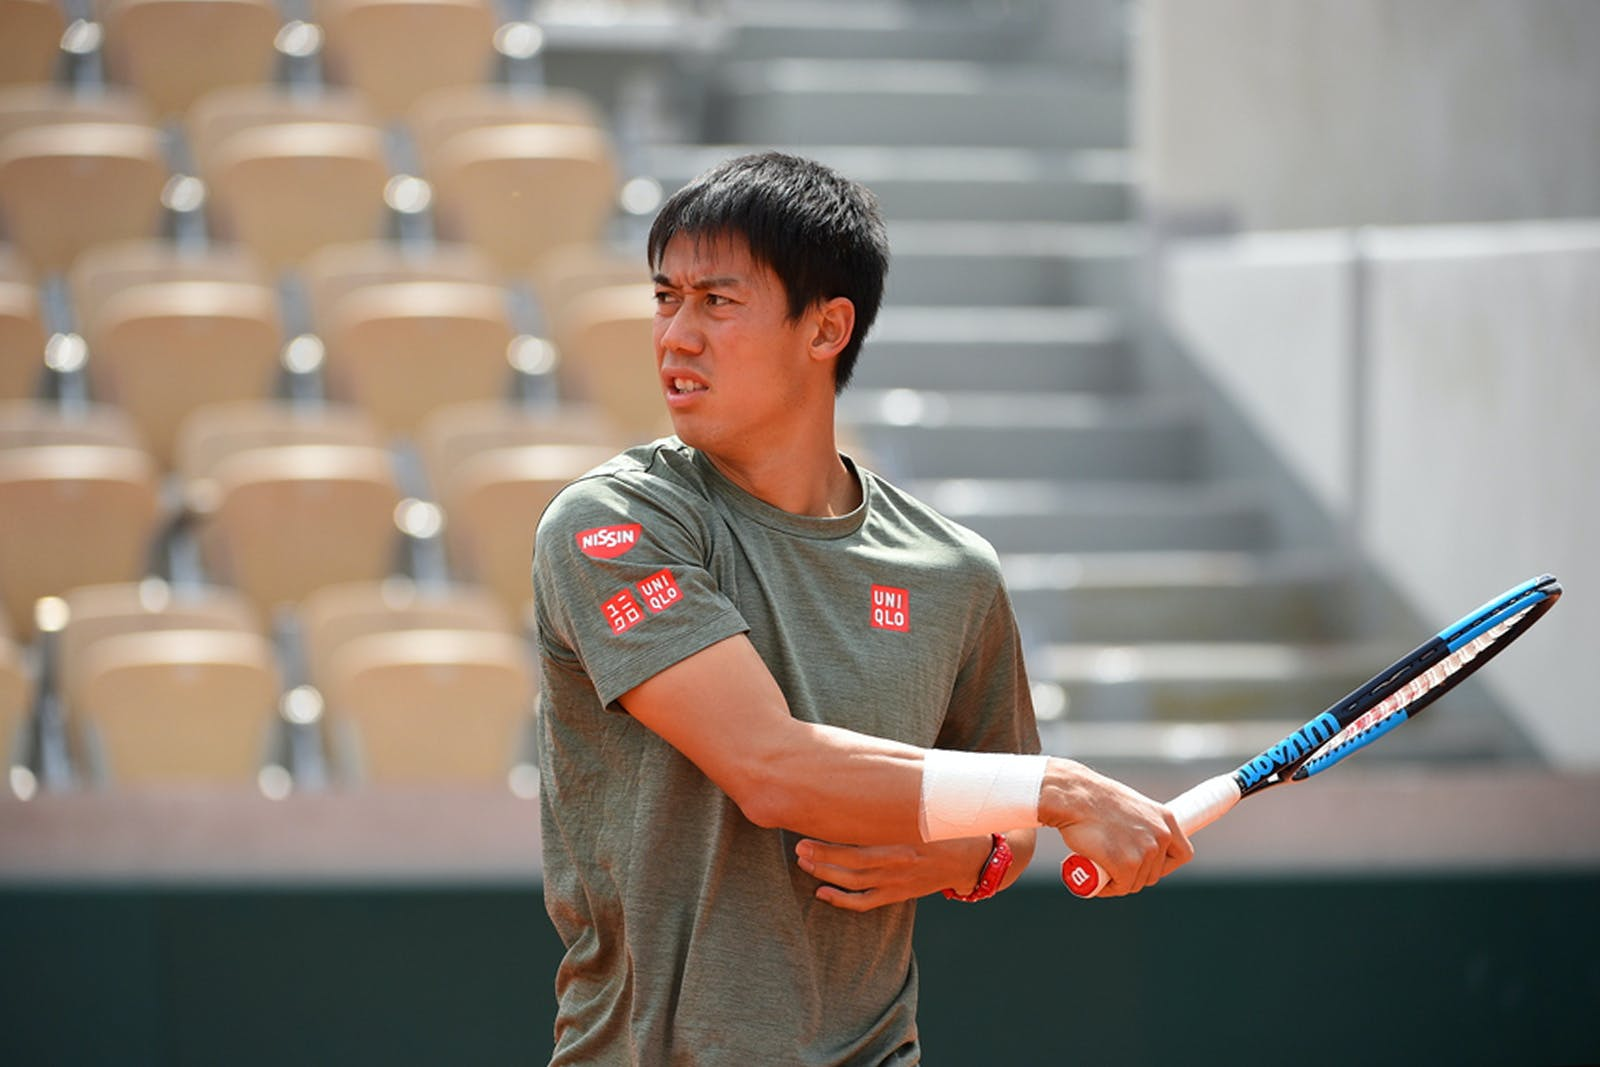 Kei Nishikori Roland Garros 2019